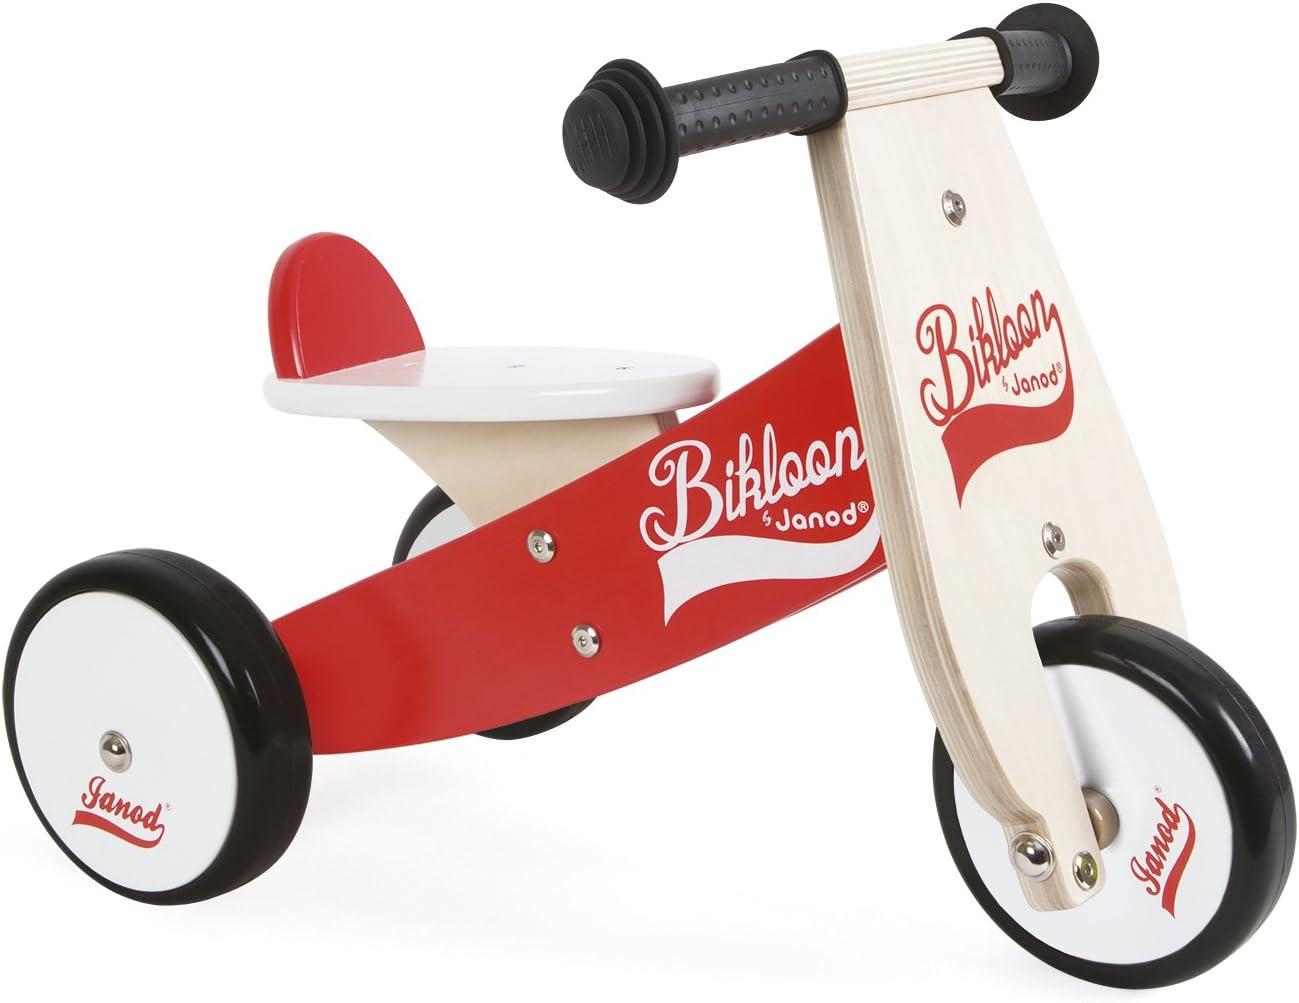 Janod - Bicicleta sin pedales Bikloon, madera, color rojo / blanco (J03261)